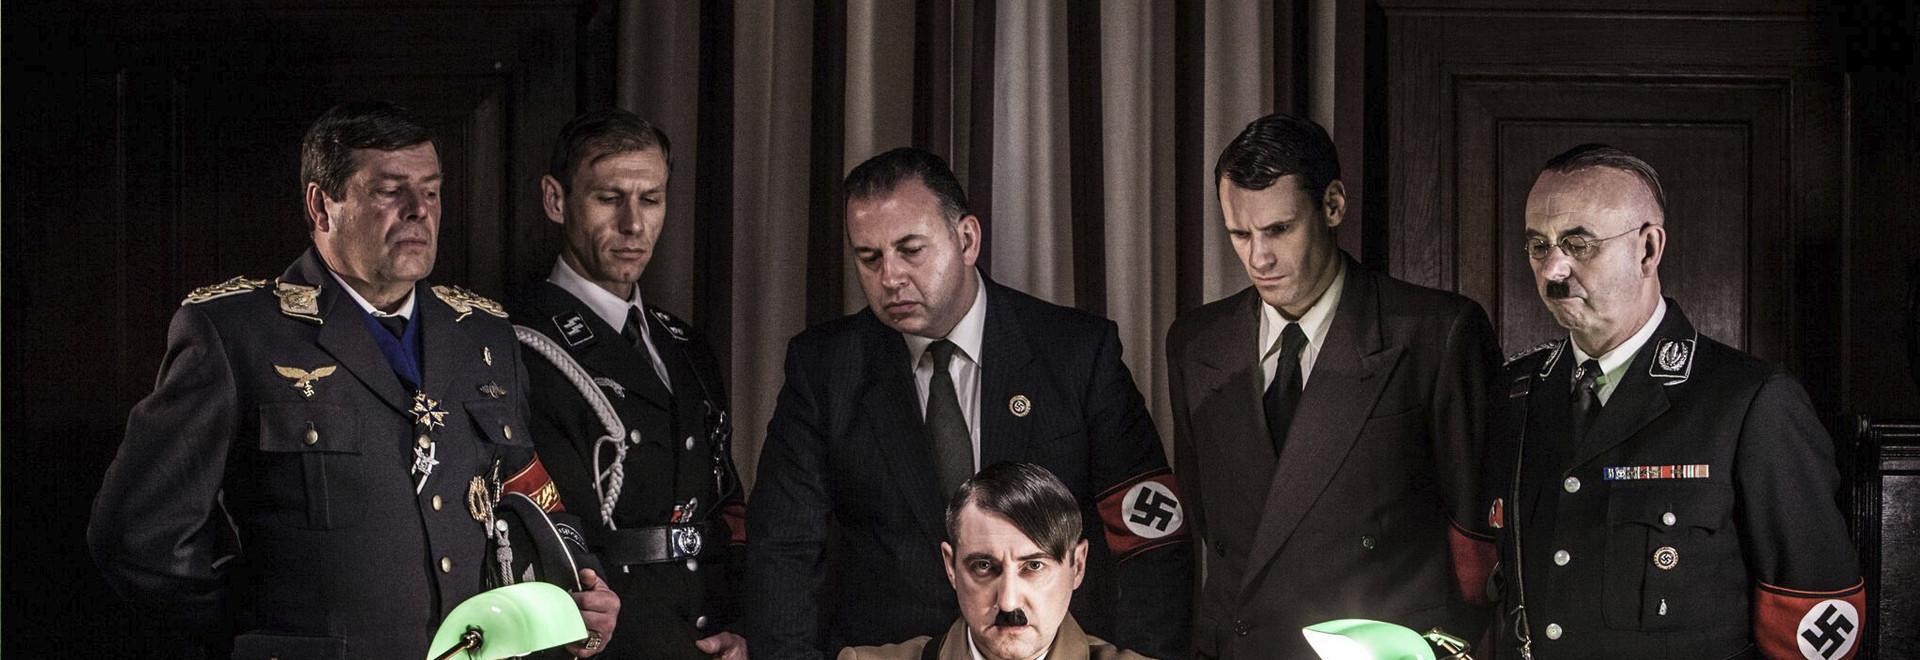 Göring vs Goebbels